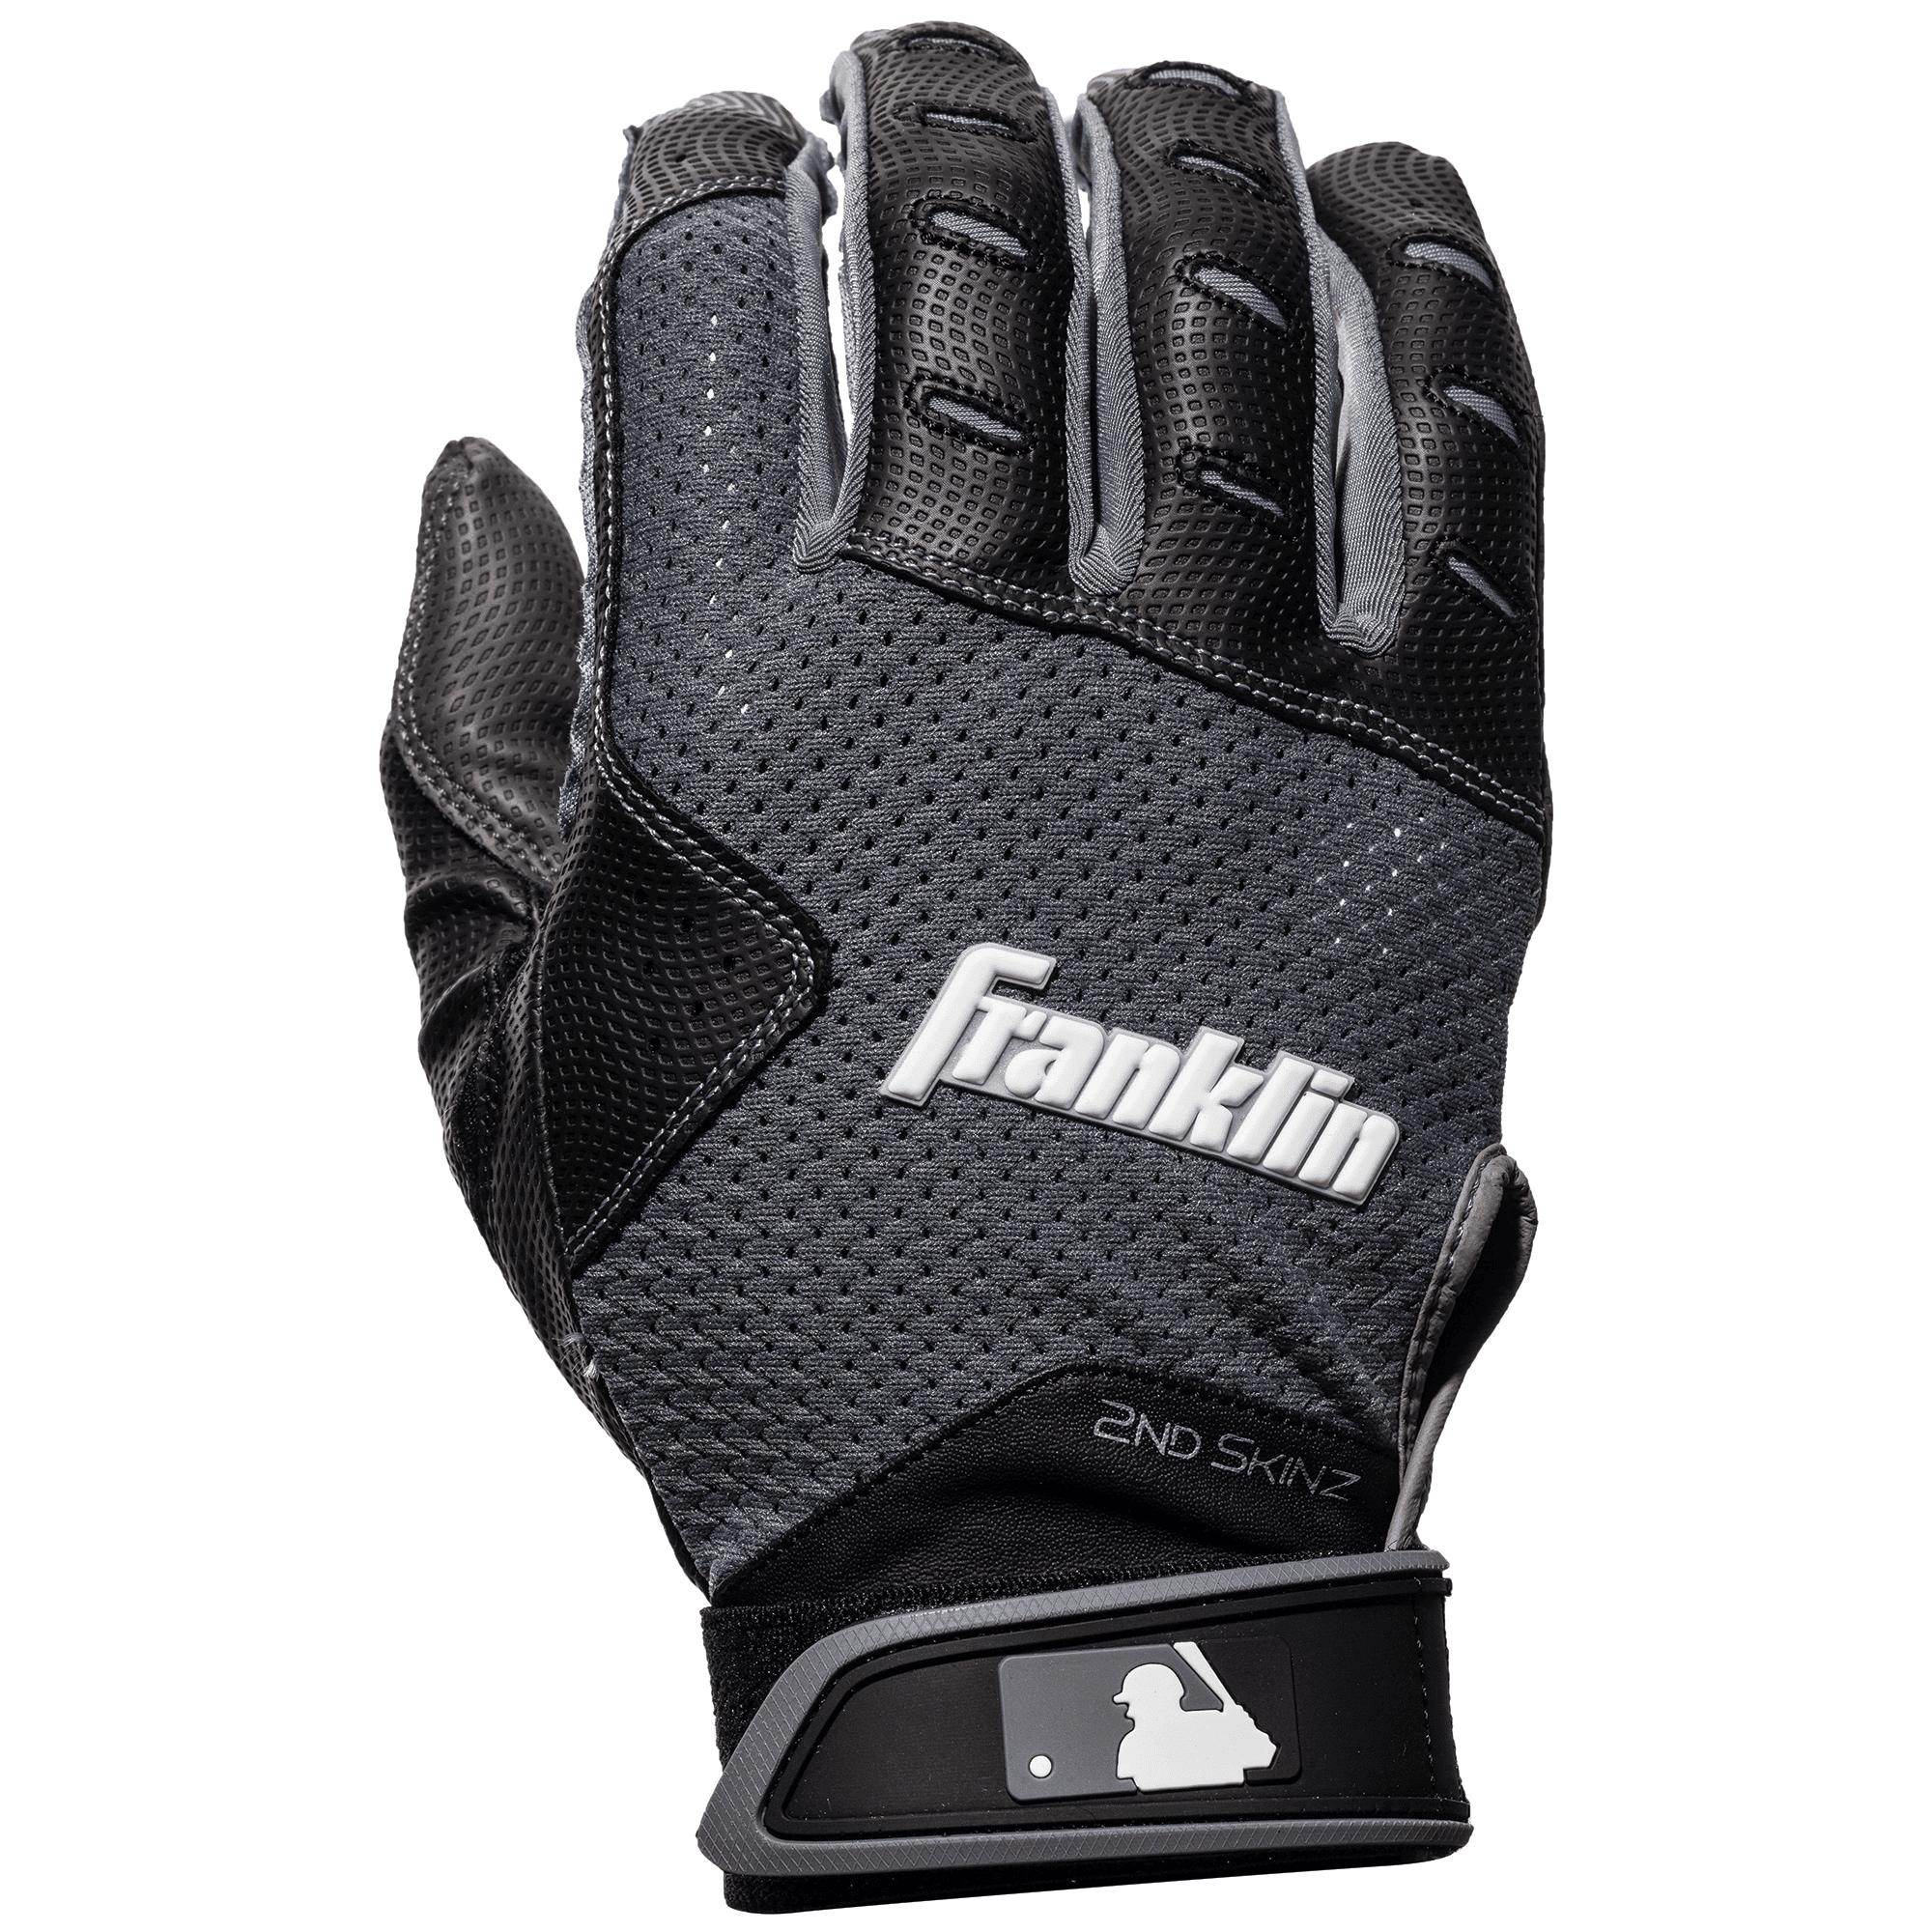 Franklin Womens Fast Pitch 2nd Skinz Batting Gloves